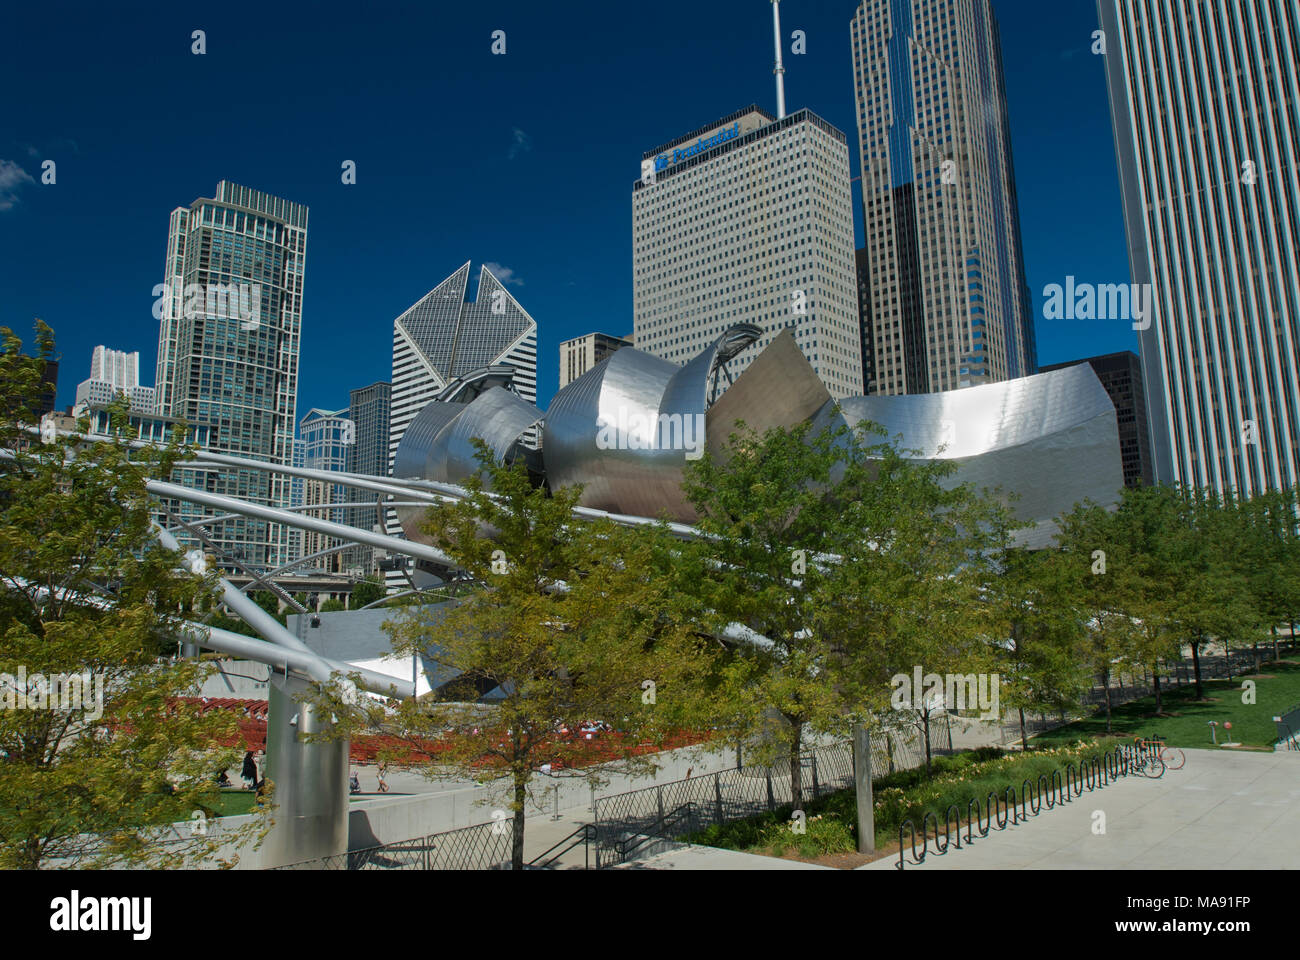 Jay Pritzker Pavilion, Millennium Park (a part of Grant Park)  Chicago, Illinois. Trellis network to hold speaker system. Stainless steel headdress ab - Stock Image